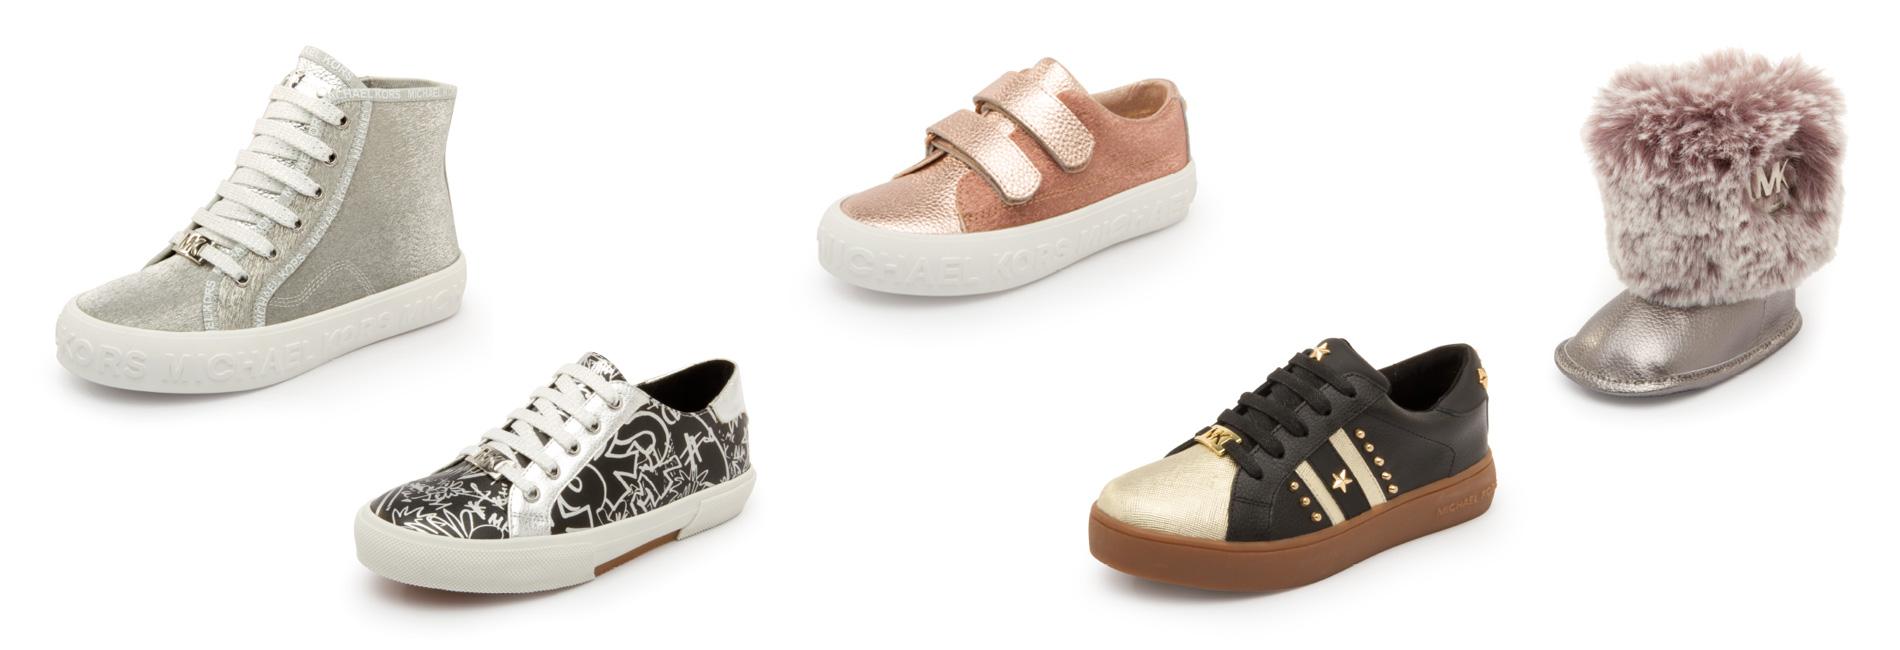 Slider-fotocommerce-2018-calzado-kors